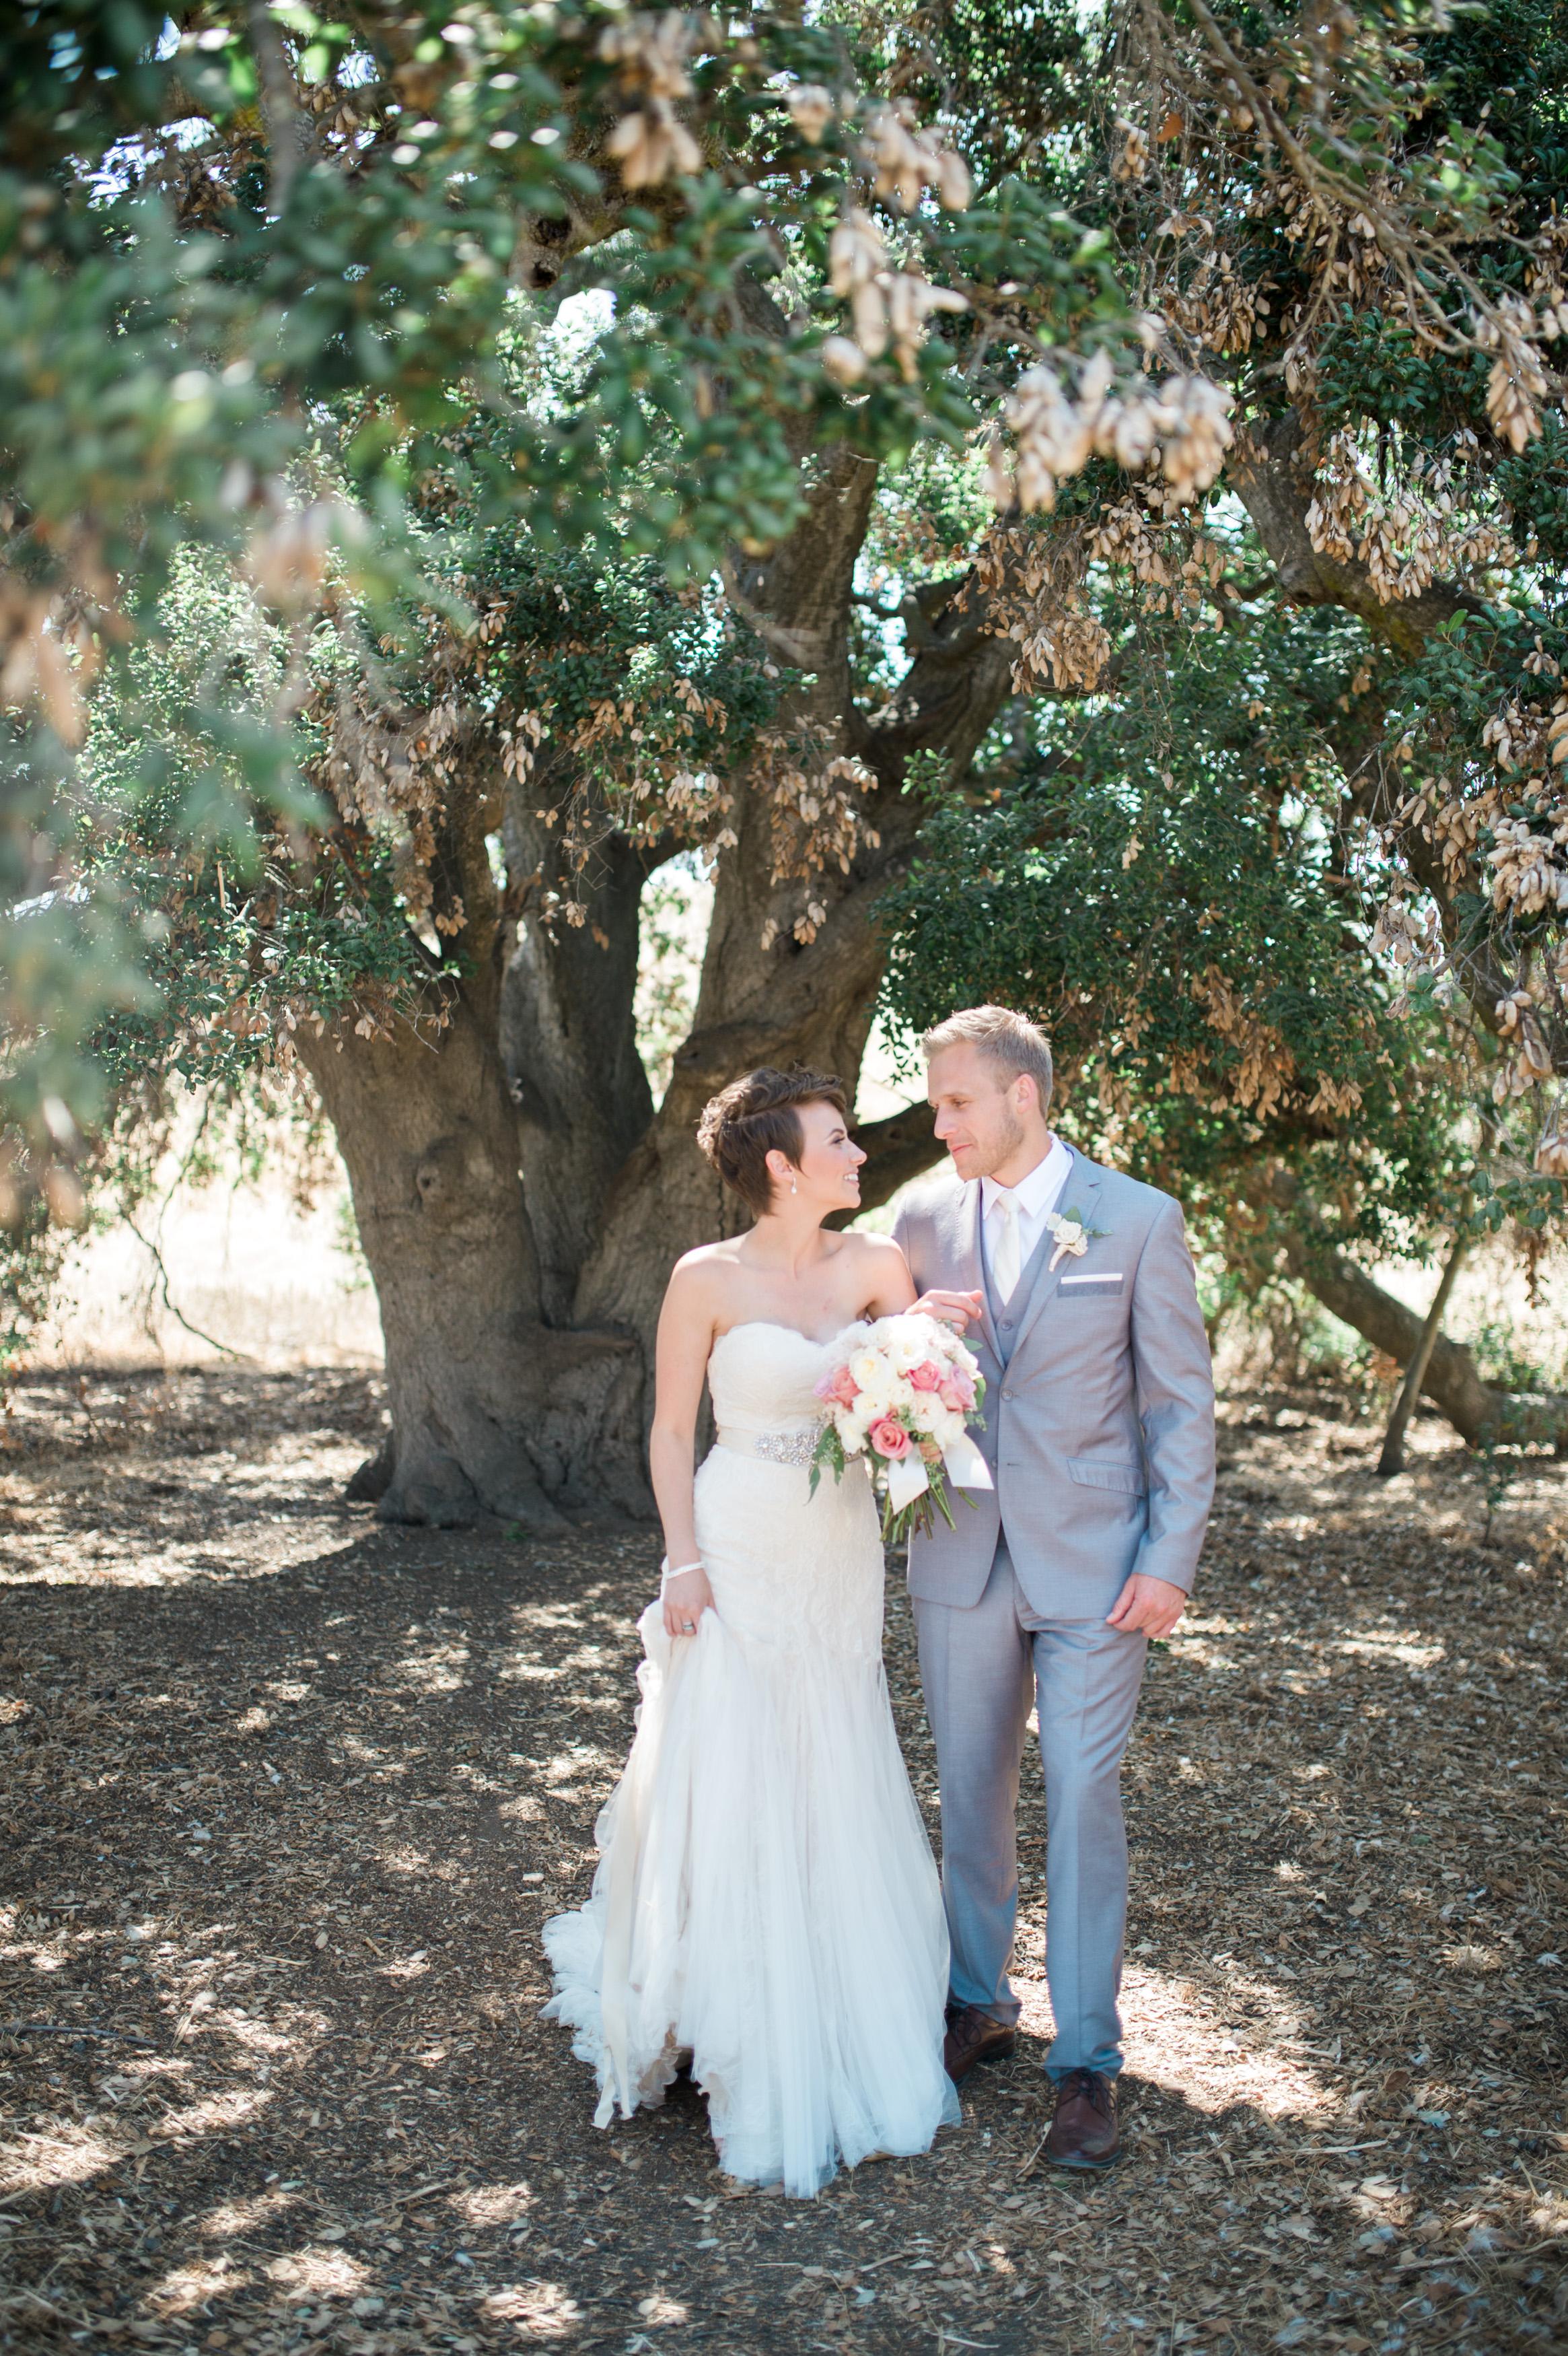 Orange County, CA Wedding Photographer | Jennifer Lourie